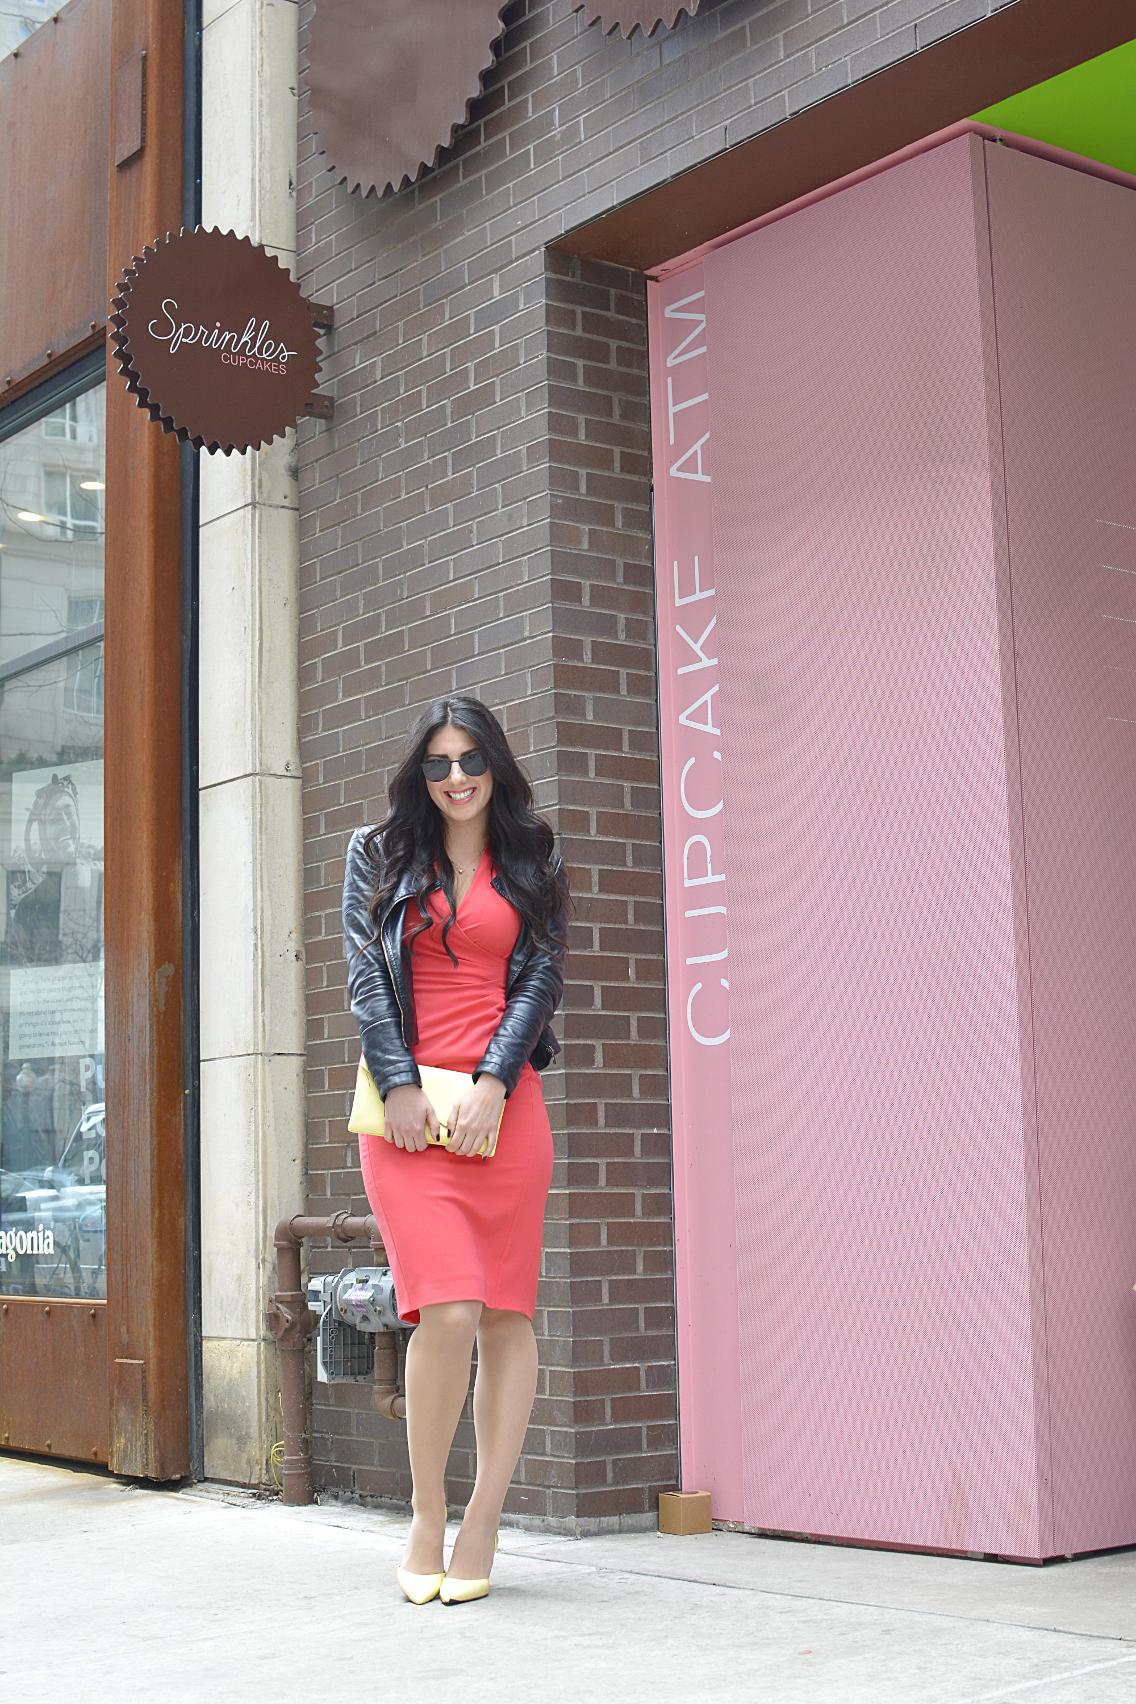 LK Bennett Sprinkles Cupcakes Chicago Jules a la Mode